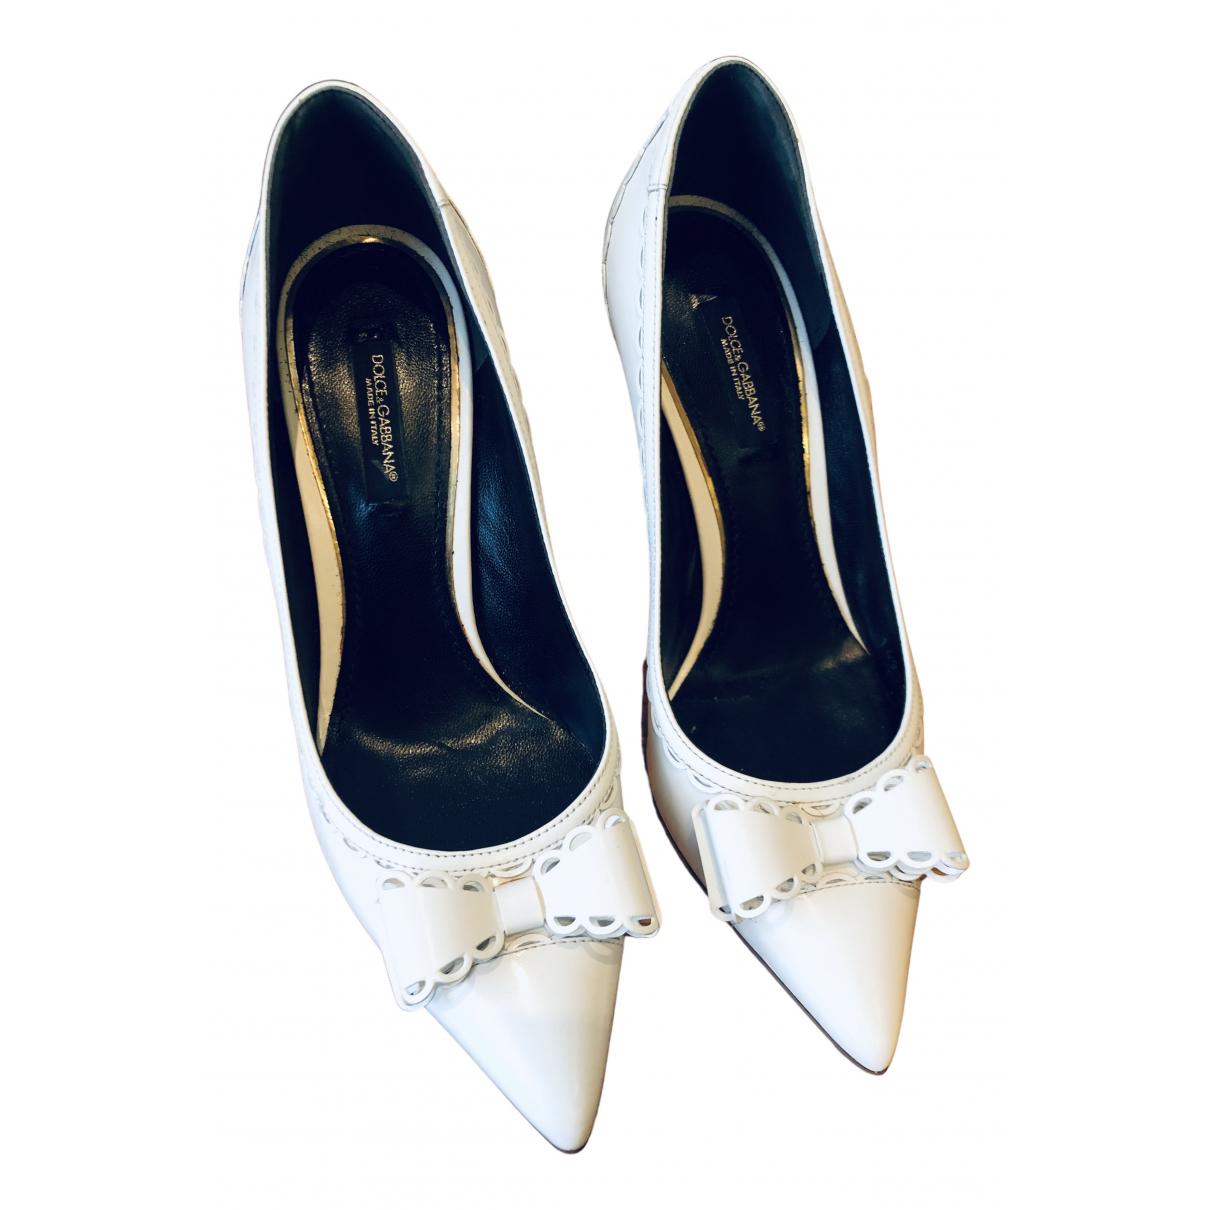 Dolce & Gabbana N White Leather Heels for Women 36 EU